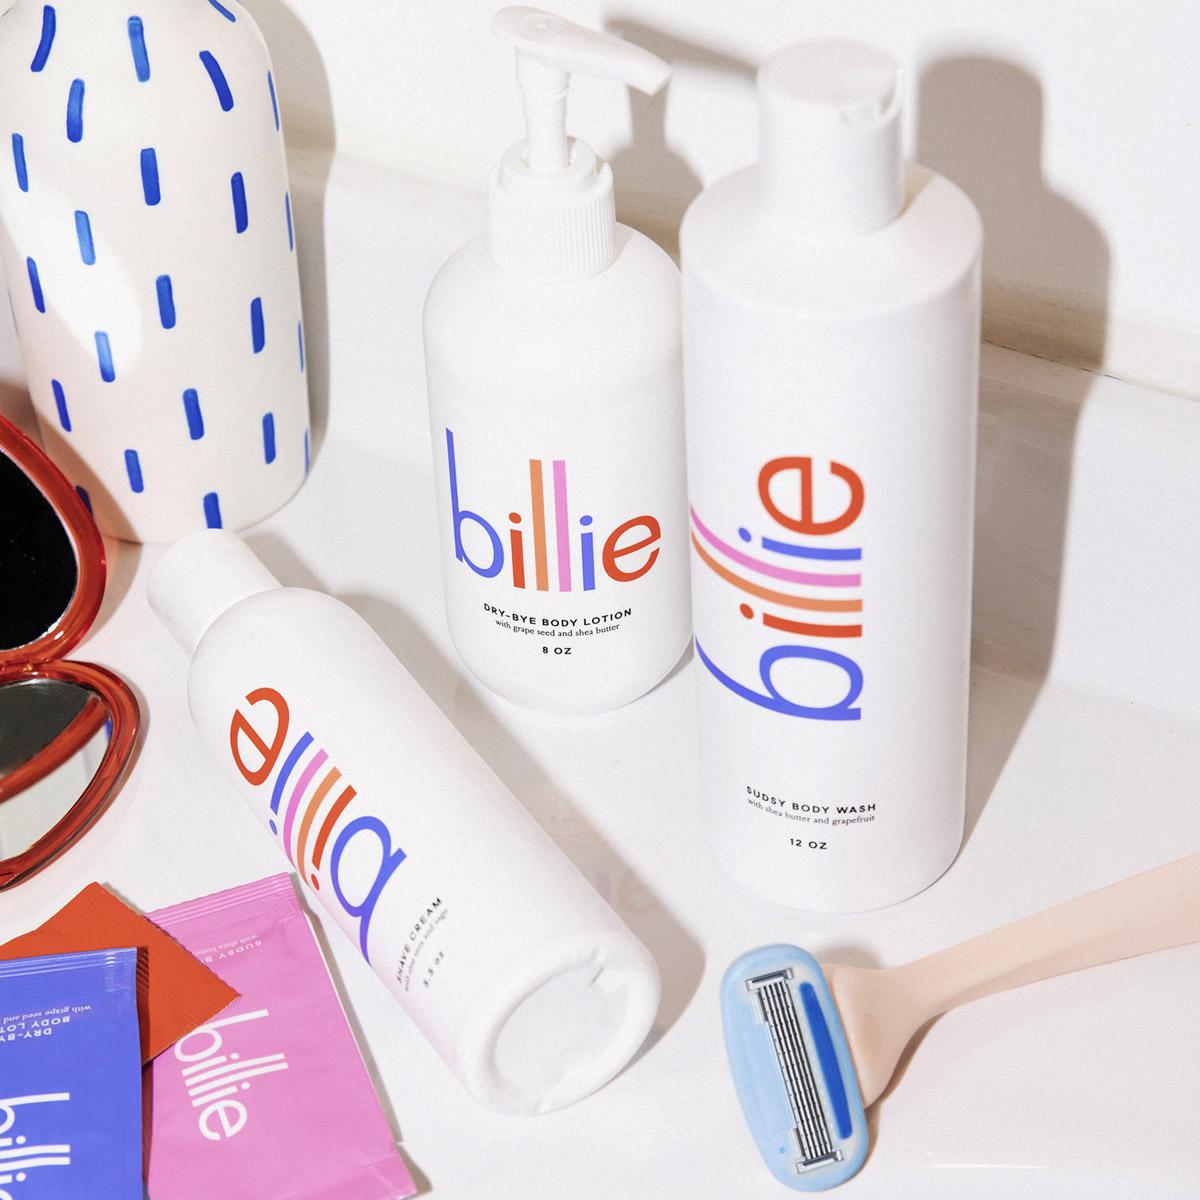 billie-razors-body-products.jpg